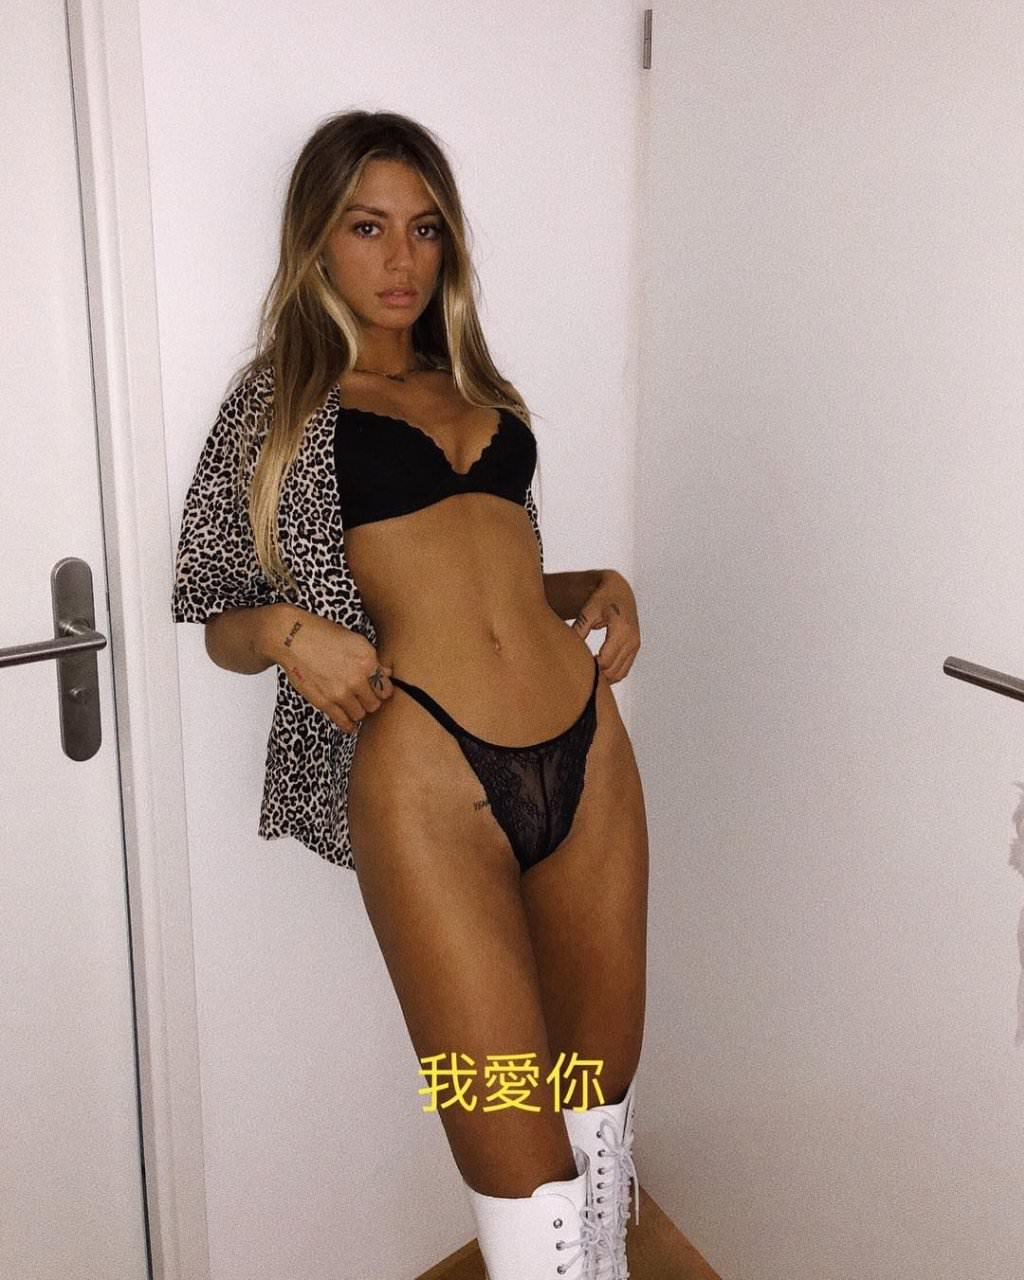 Pauline Tantot Nude Onyfans Leaked 0167